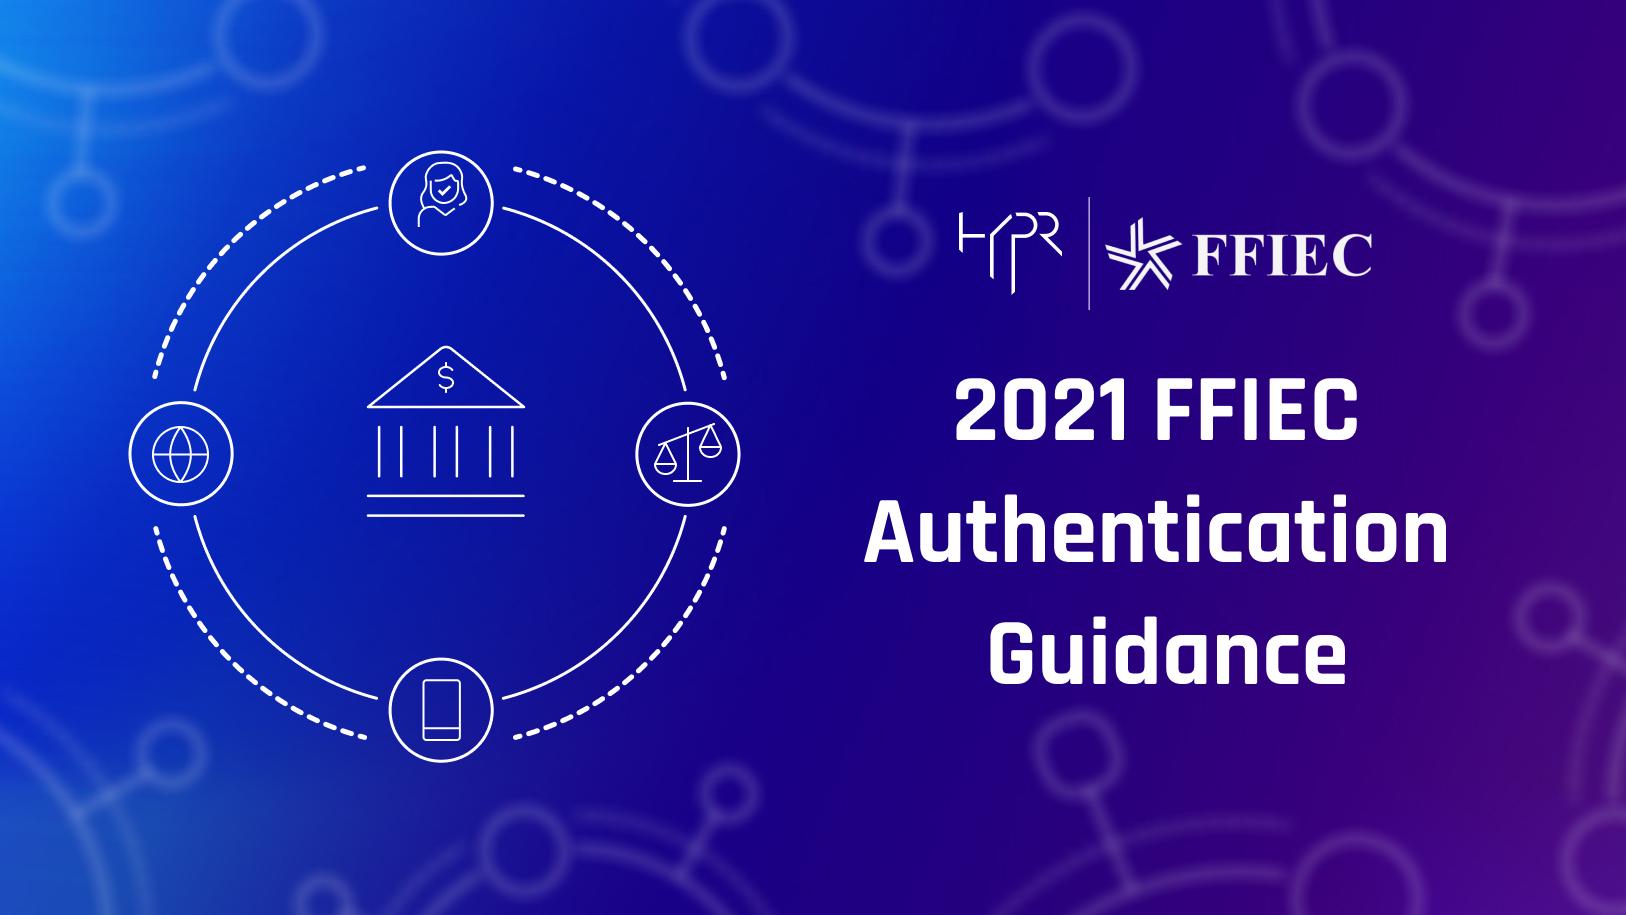 The FFIEC Endorses Passwordless MFA